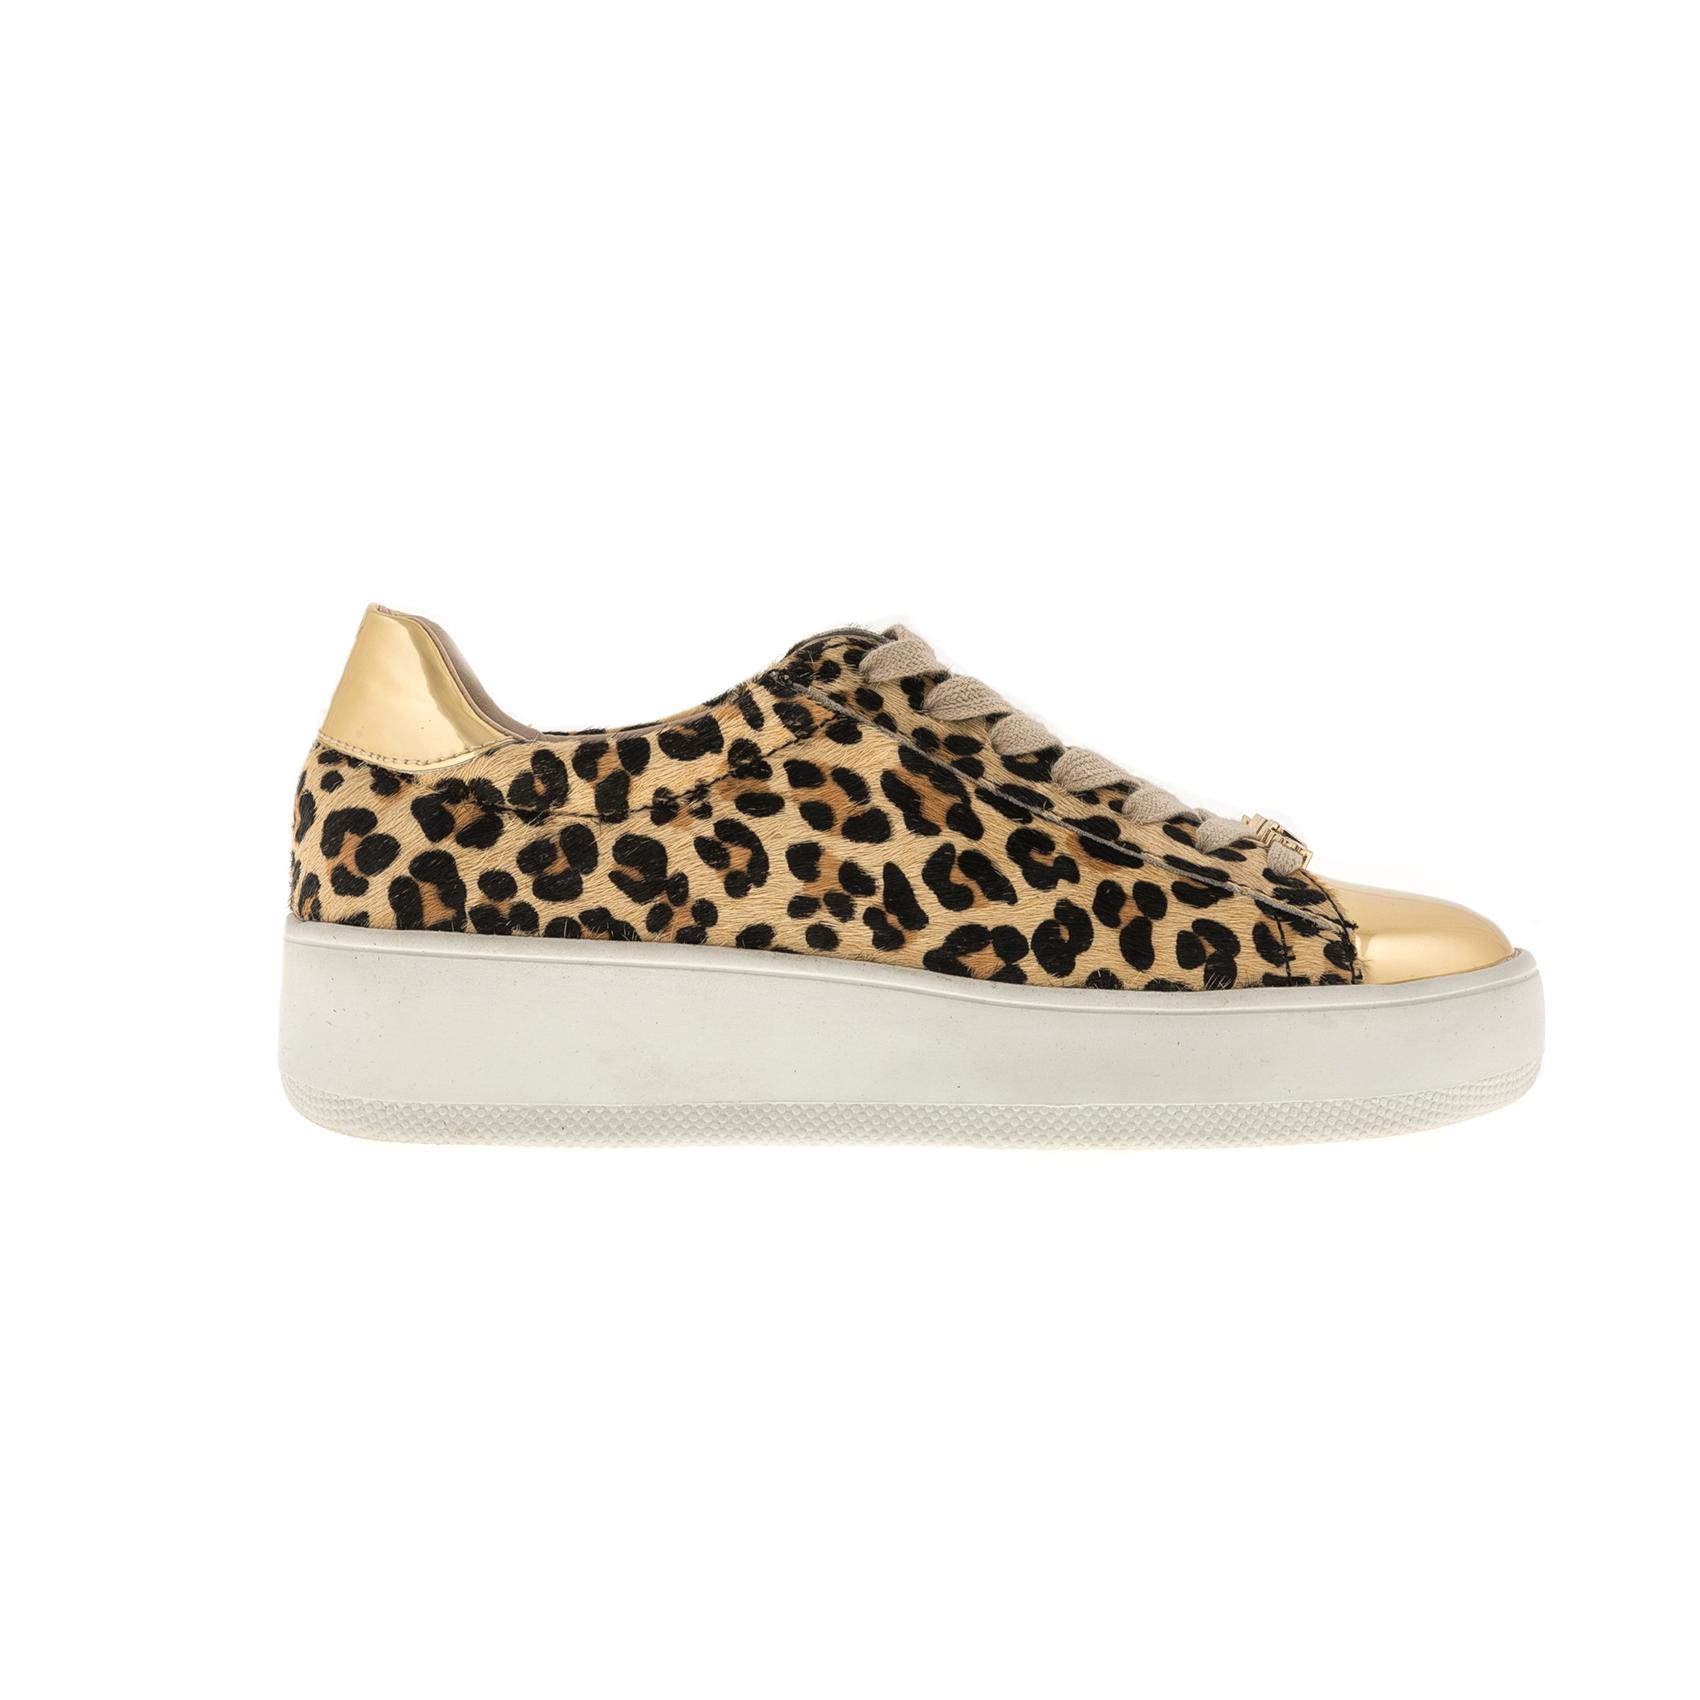 JUICY COUTURE – Γυναικεία παπούτσια JUICY COUTURE BELINNDA λεοπάρ